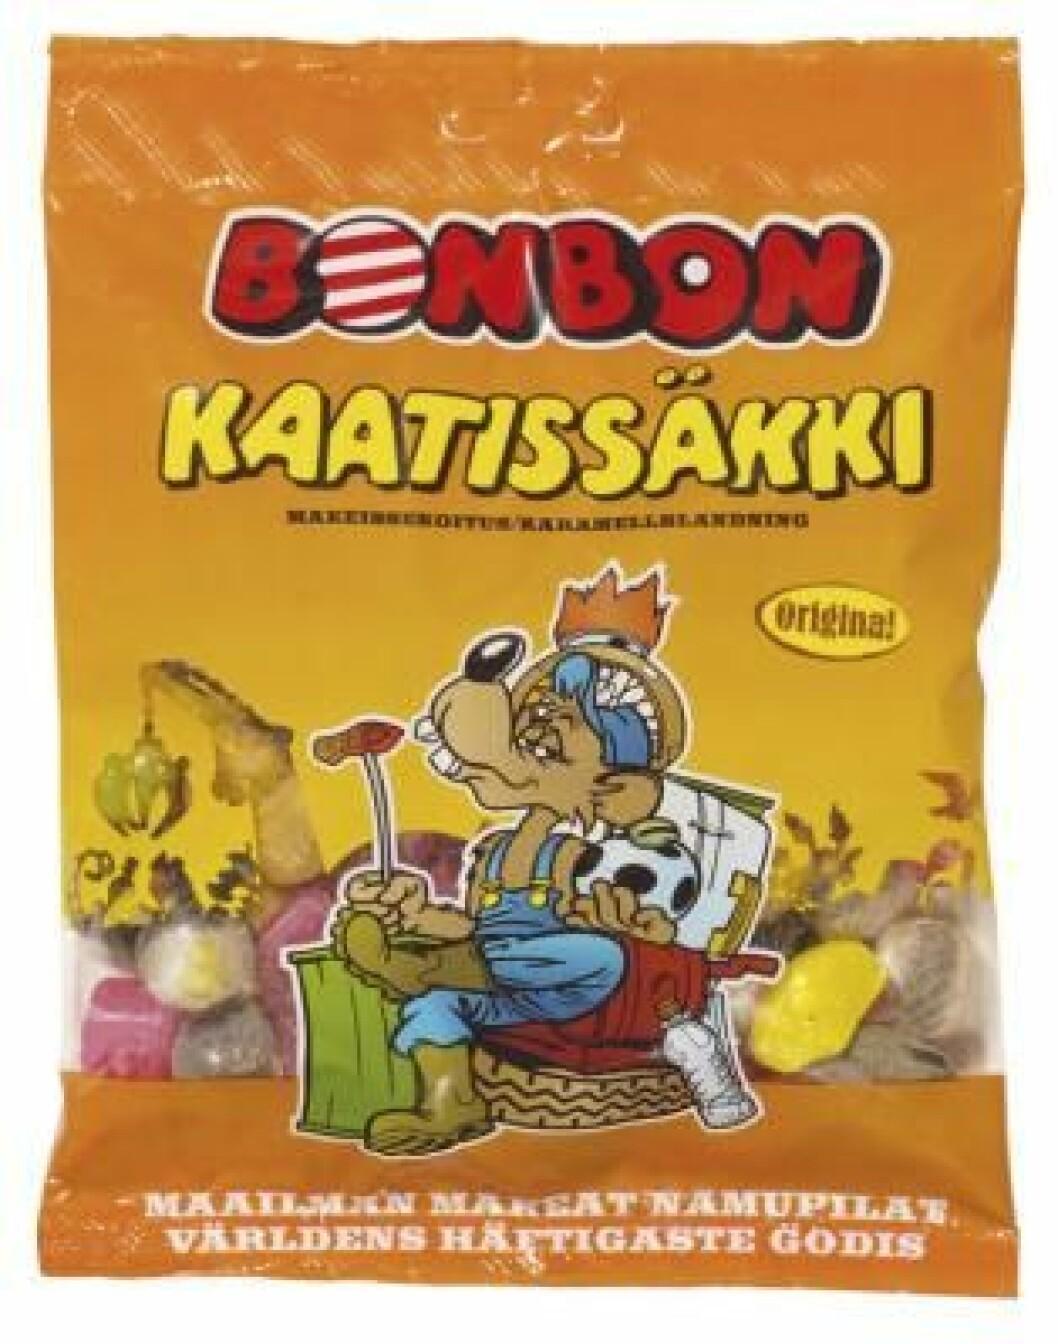 bonbon sopsack